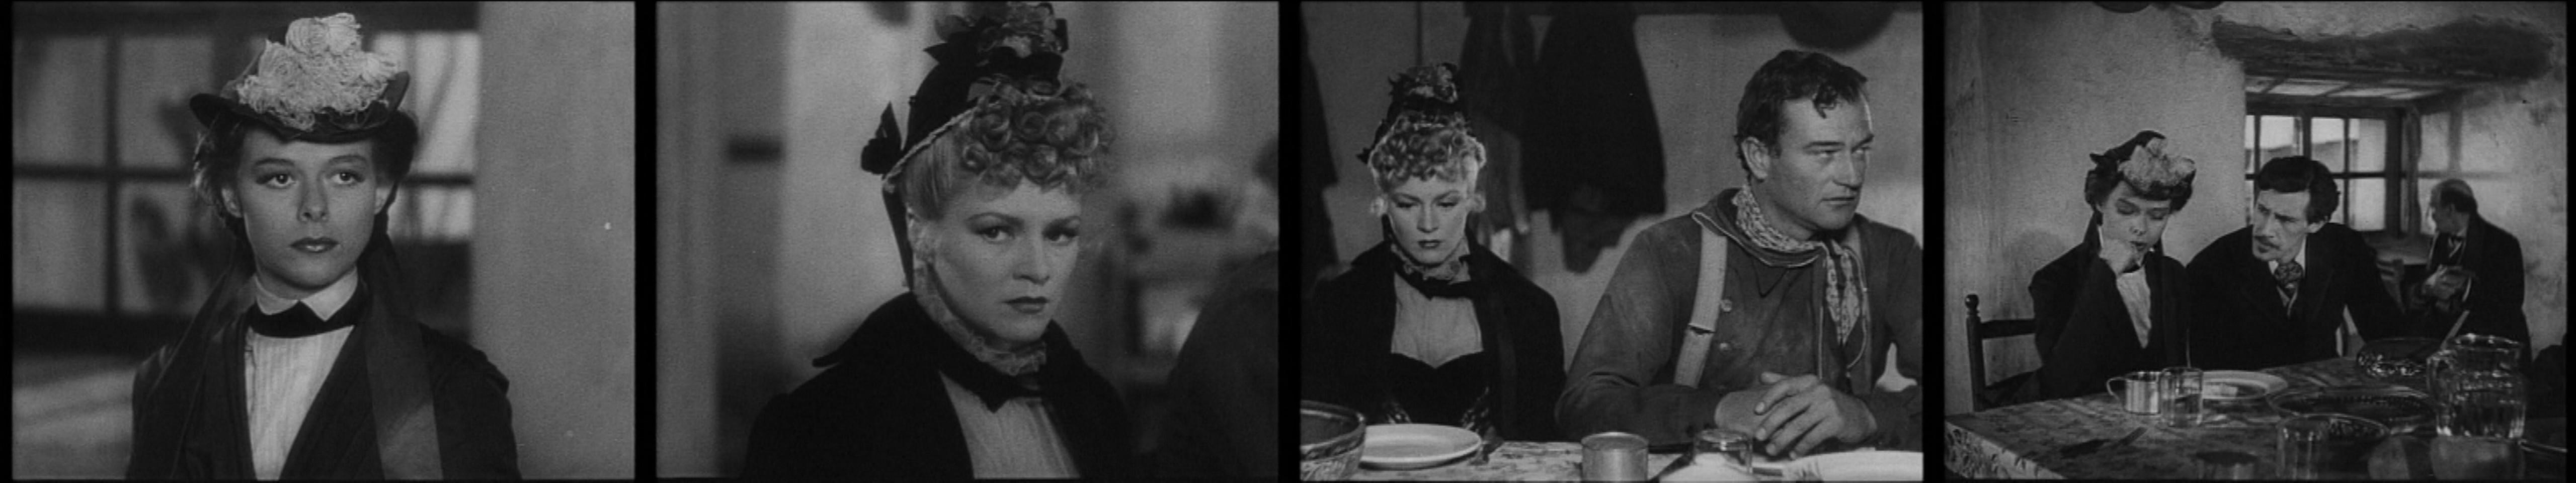 """Immagini dal film Ombre Rosse (1939) di John Ford."""